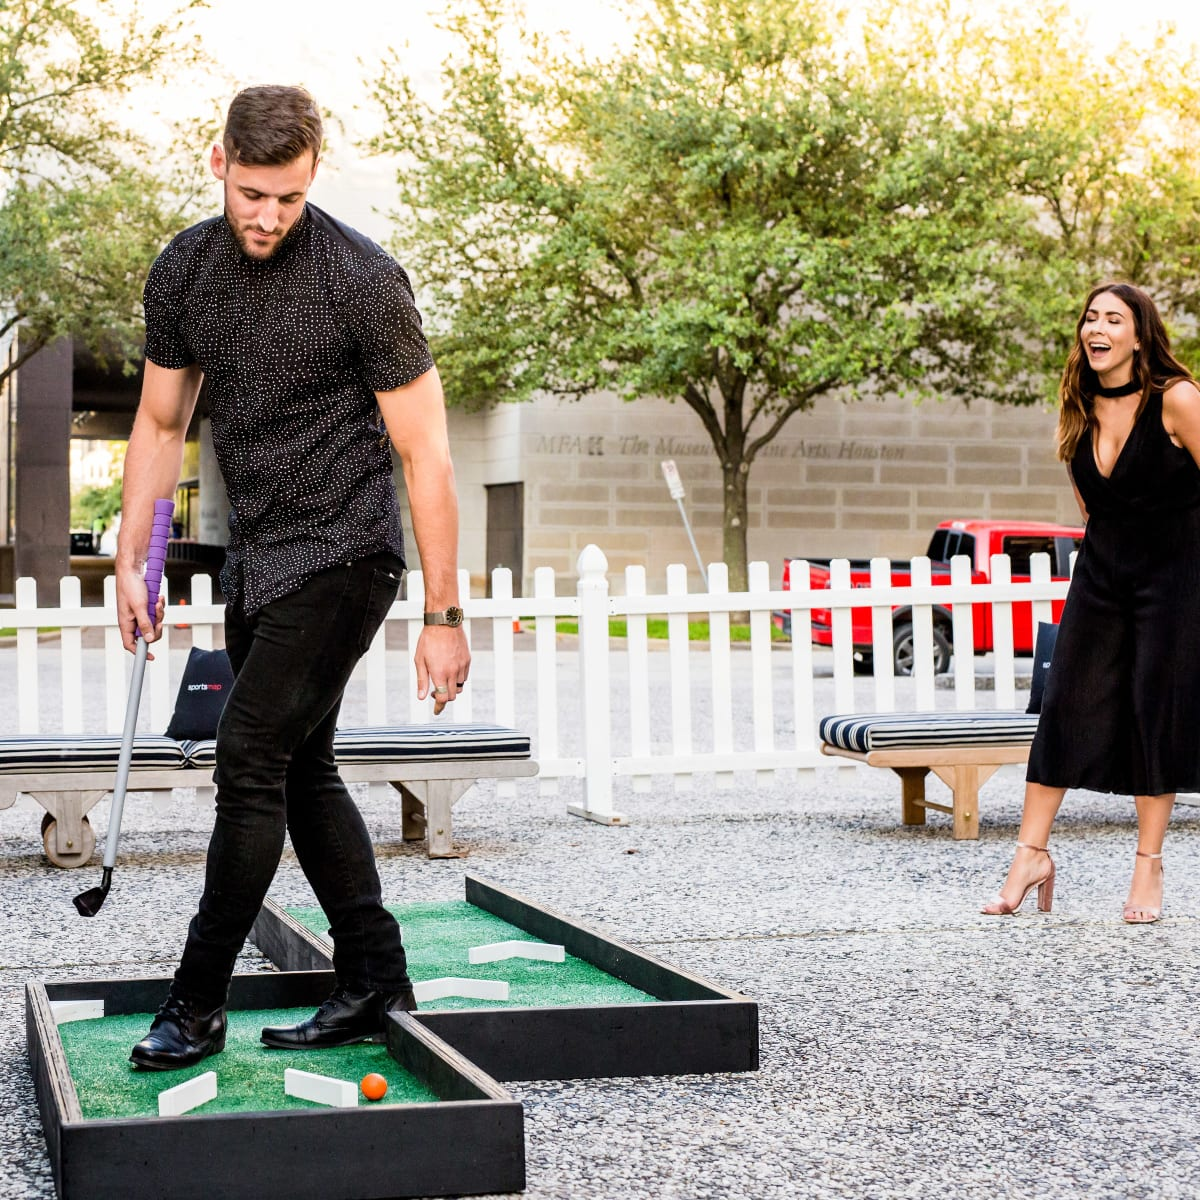 Houston, SportsMap launch party, October 2017, Sam Windsor, Becca Windsor